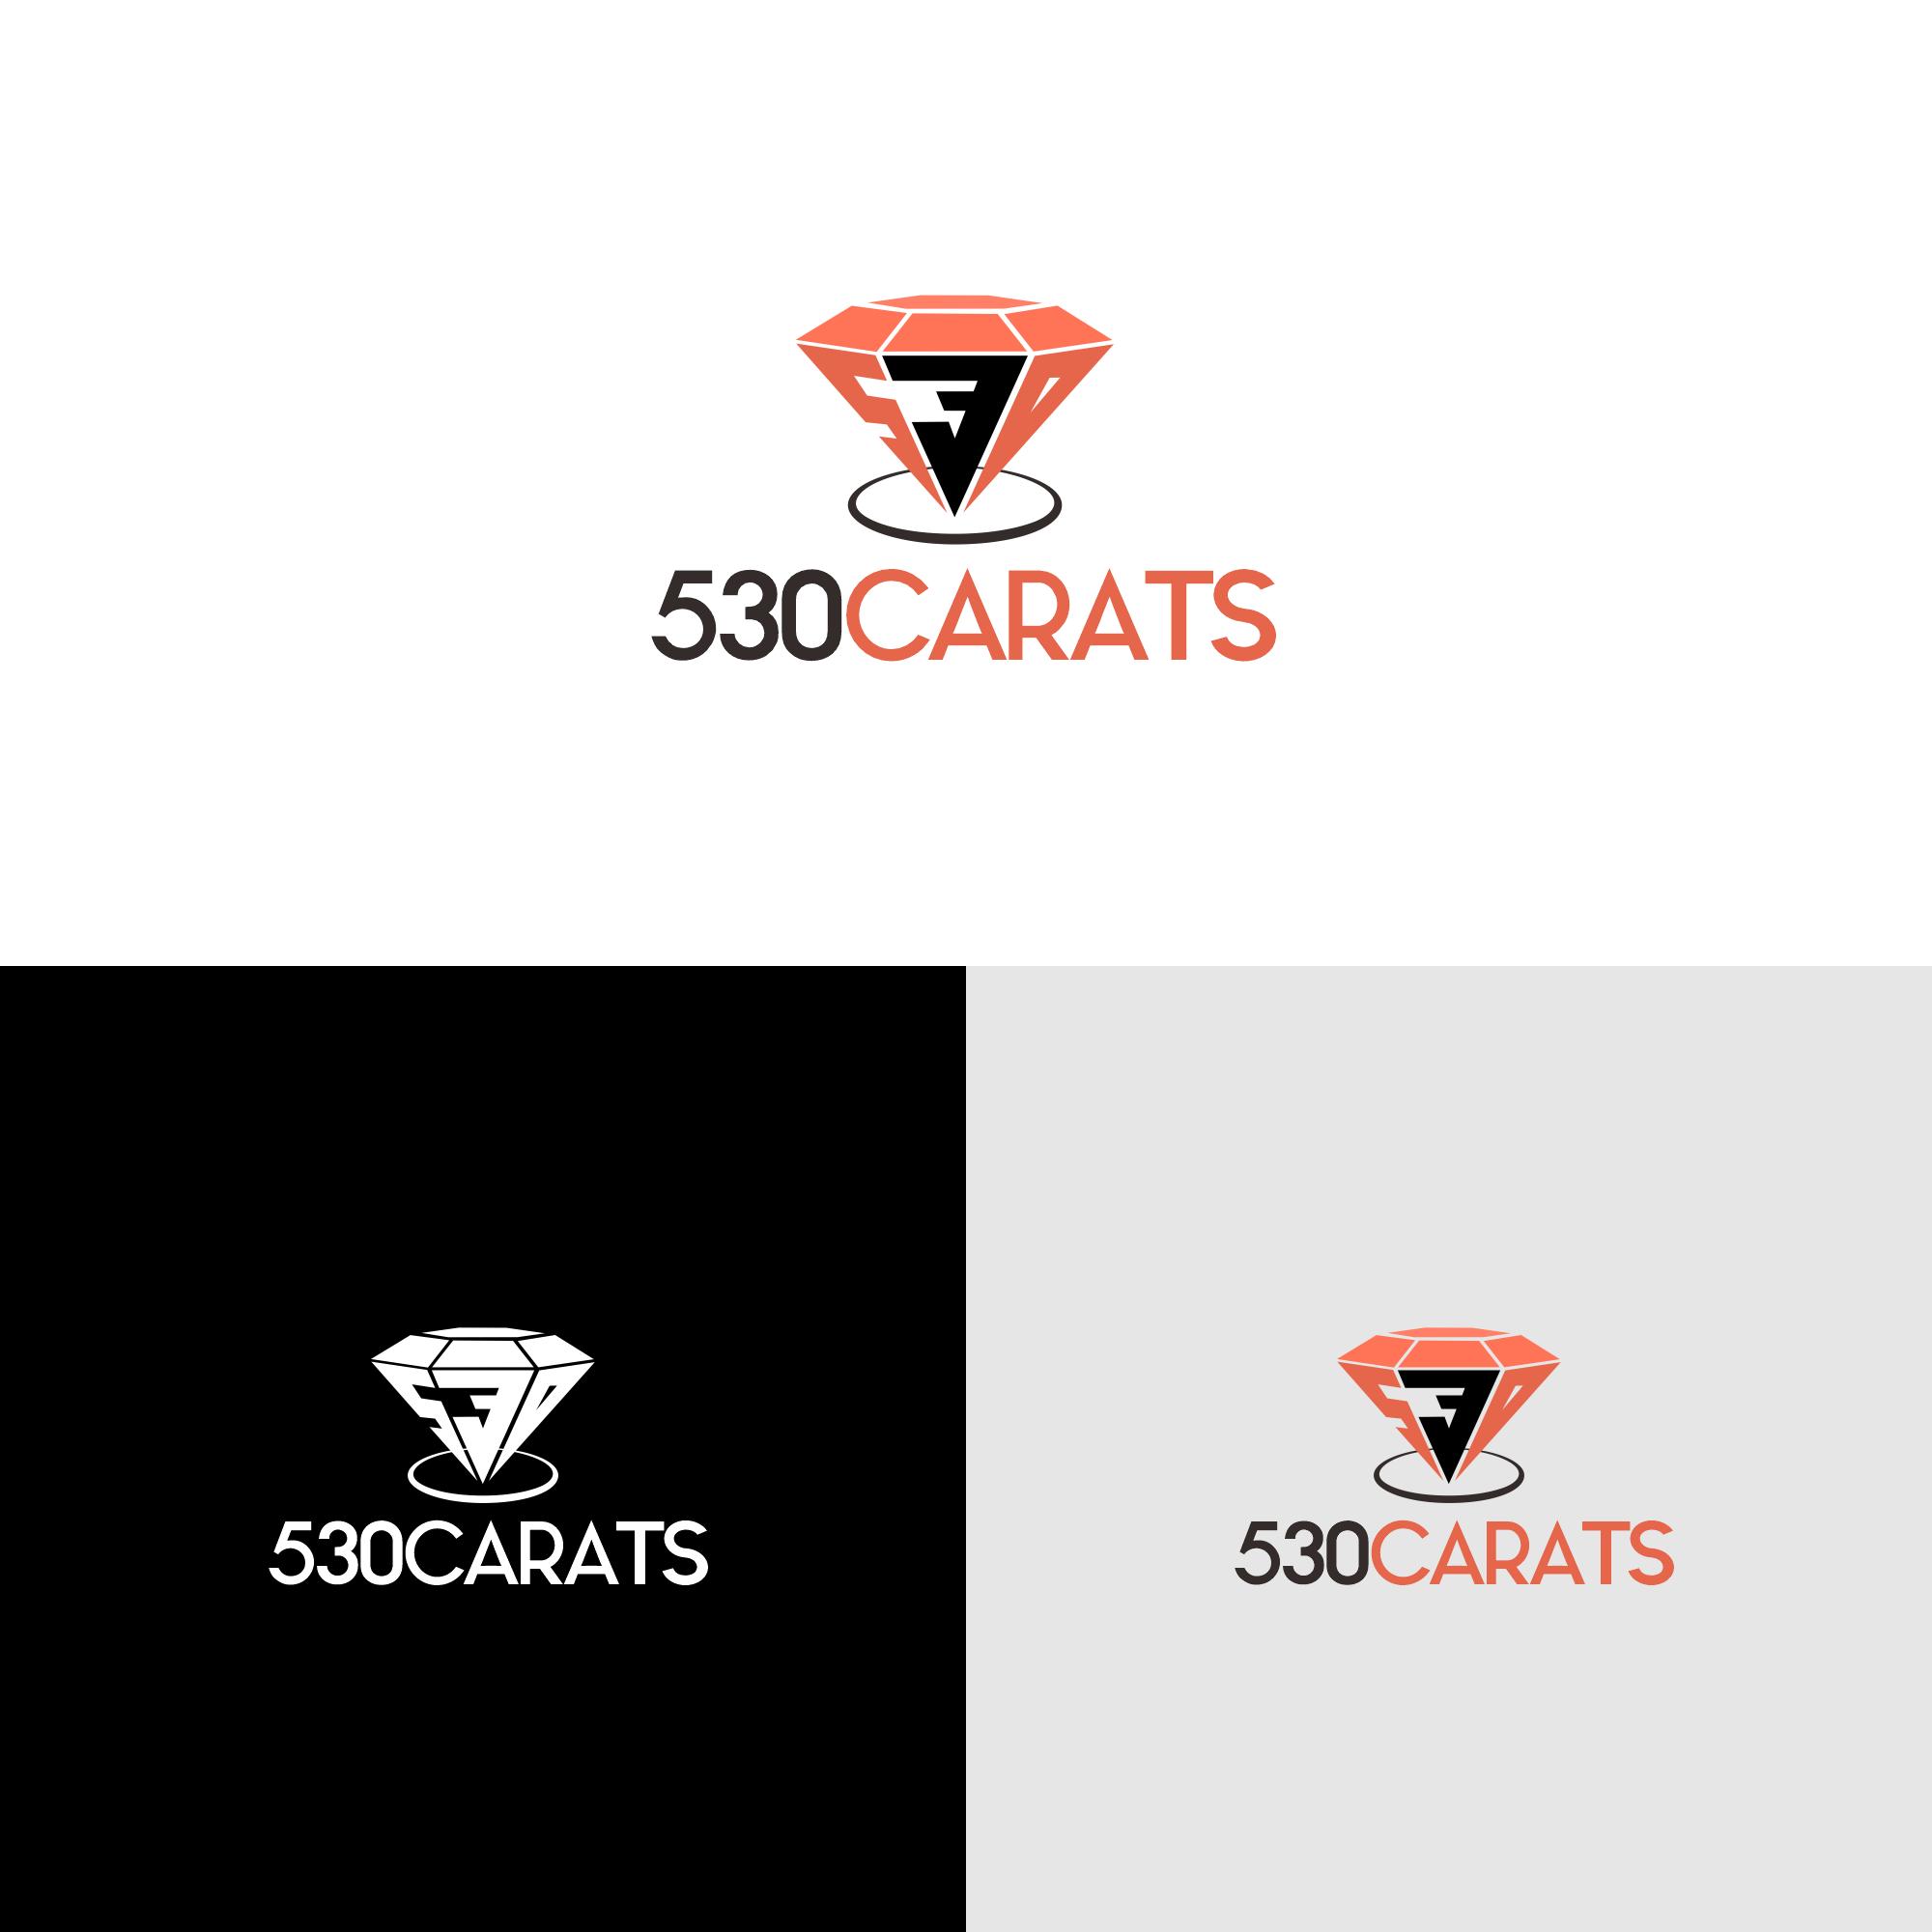 Design 59 By Baktipra Design A Powerful Logo For A New Website Like Yelp But For Minority Business In The U Logo Design Contest Web Design Logo Logo Design